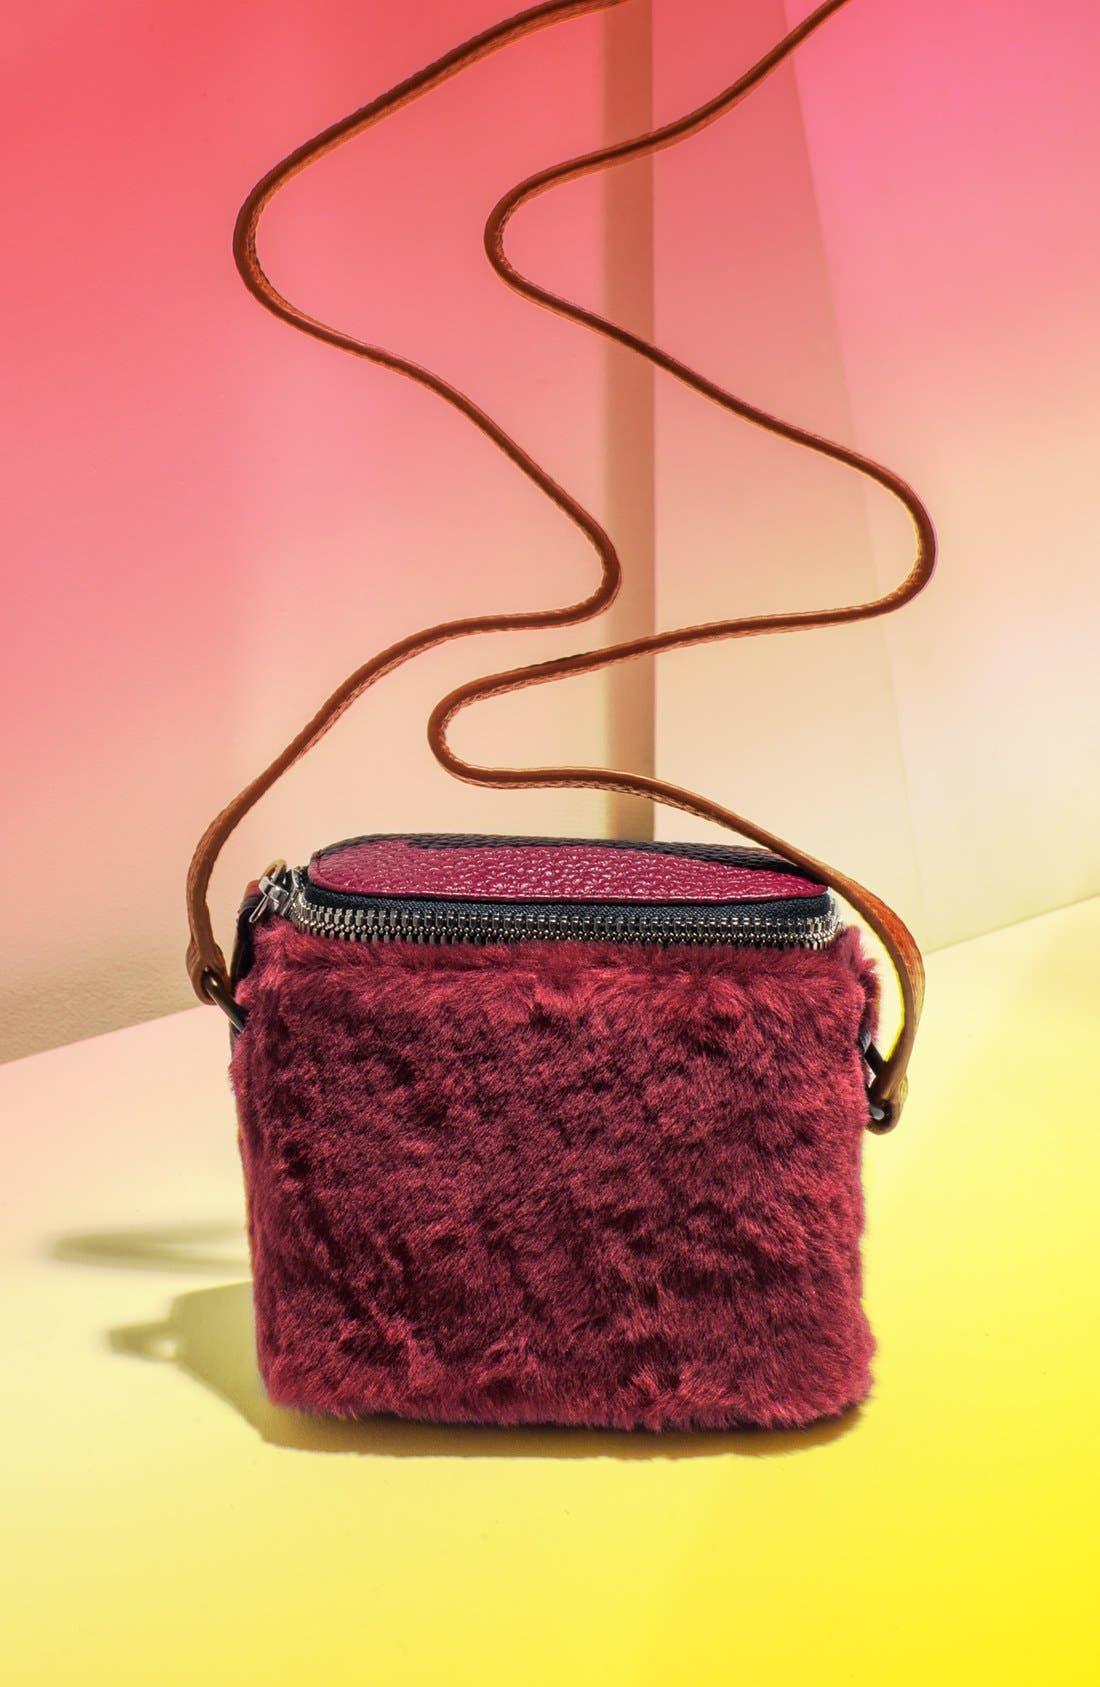 Main Image - Kara 'Stowaway' Pebbled Leather & Genuine Shearling Crossbody Bag, Small